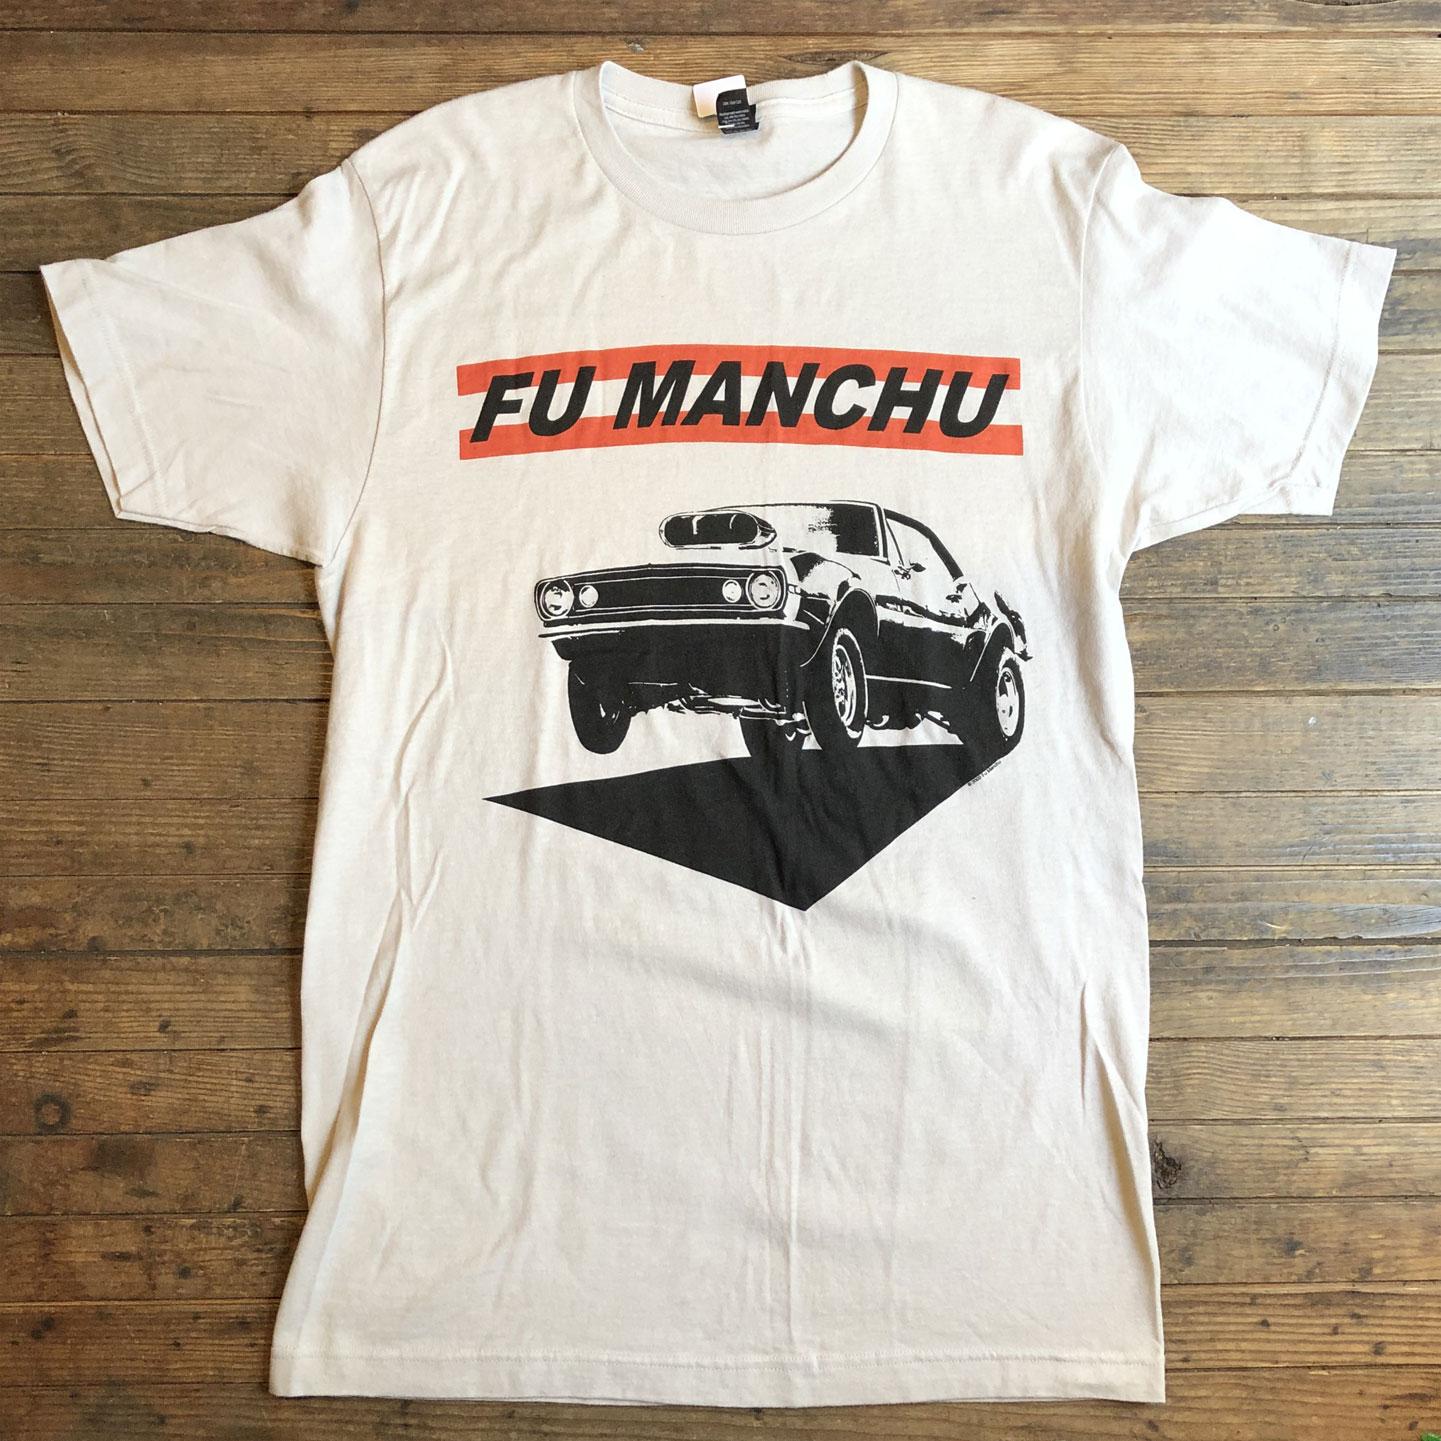 USED! FU MANCHU Tシャツ